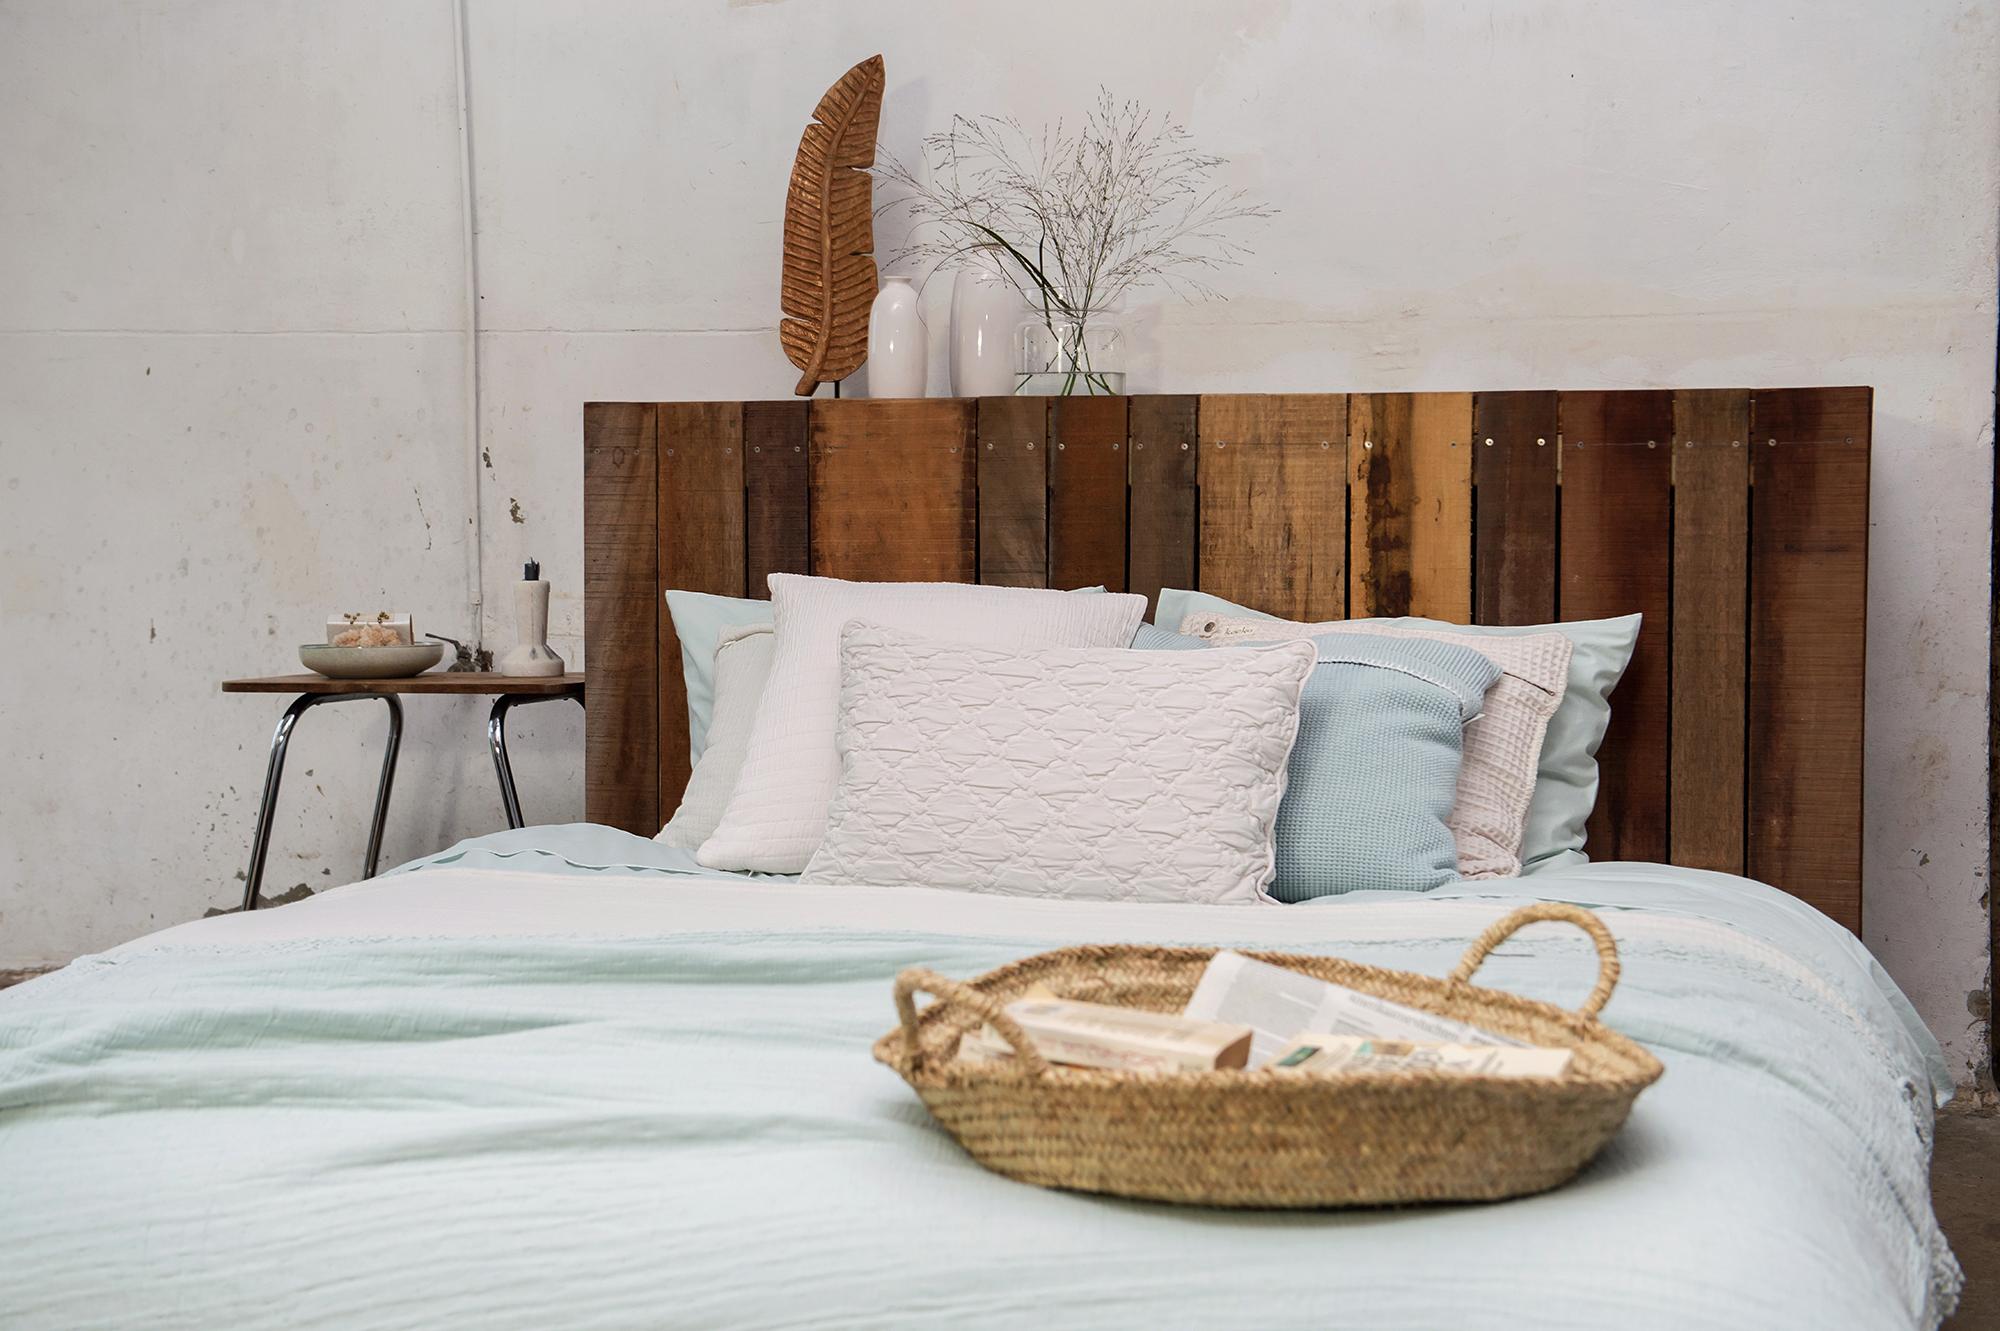 Koeka bed slaapkamer